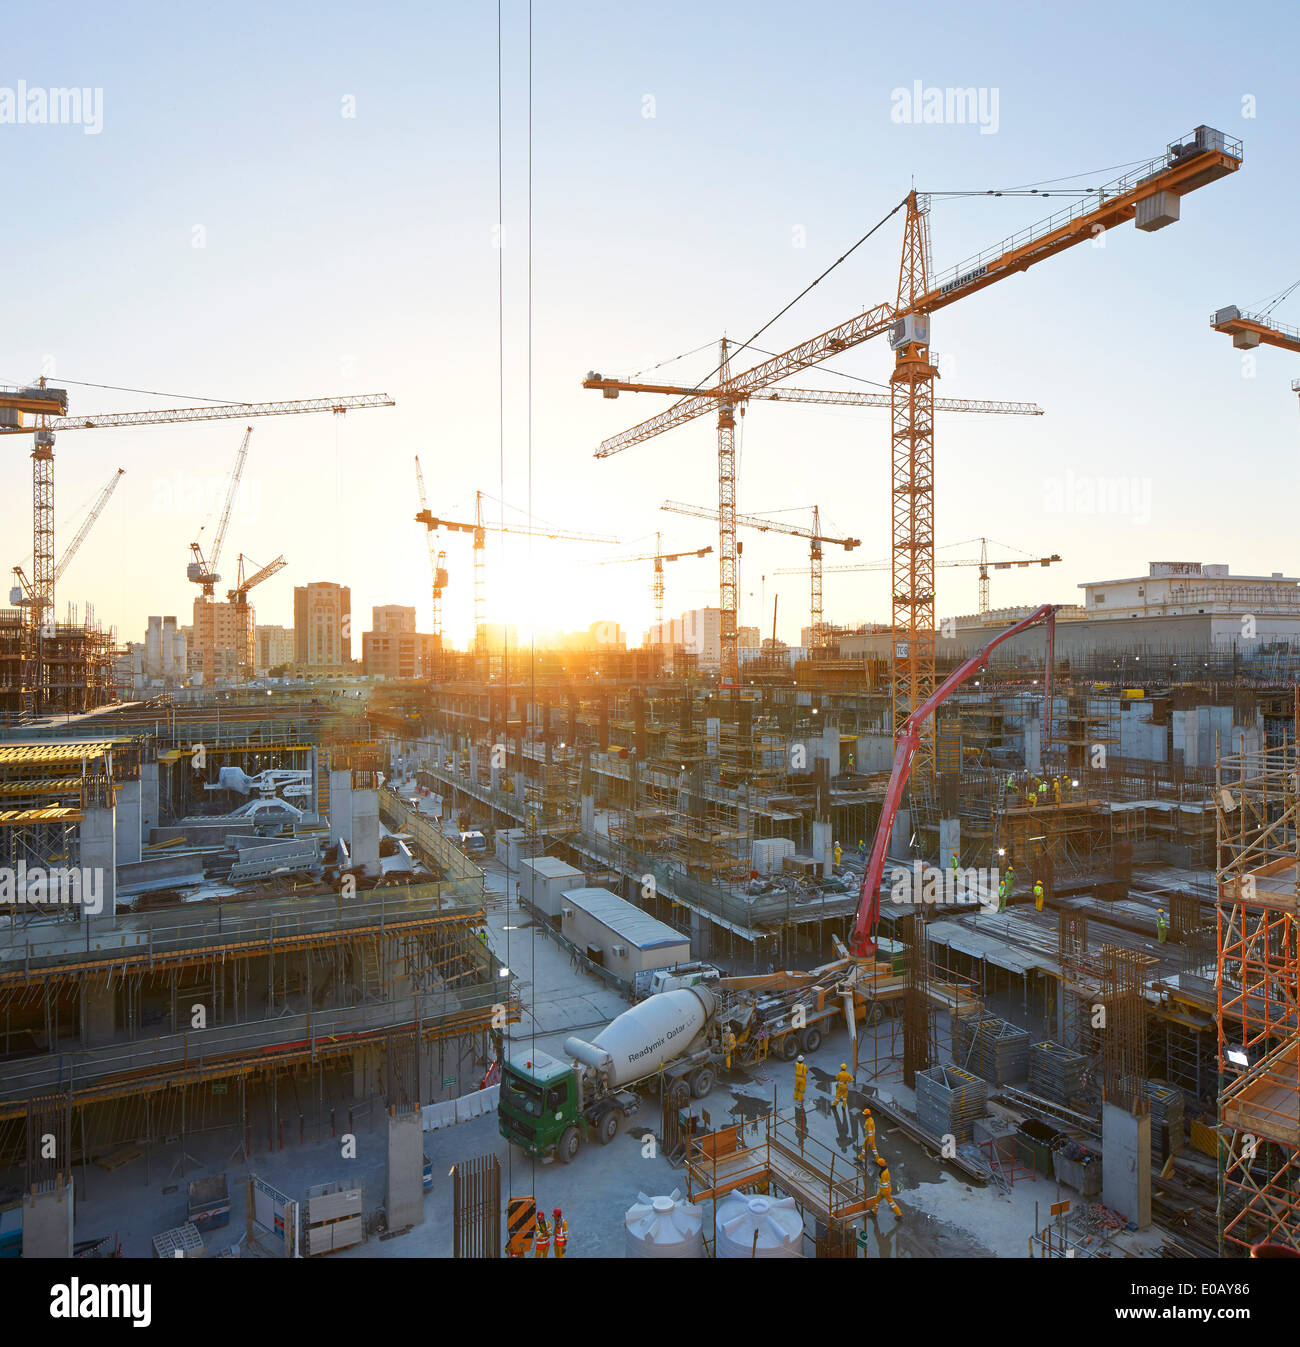 Msheireb Downtown Doha, Construction Site, Doha, Qatar